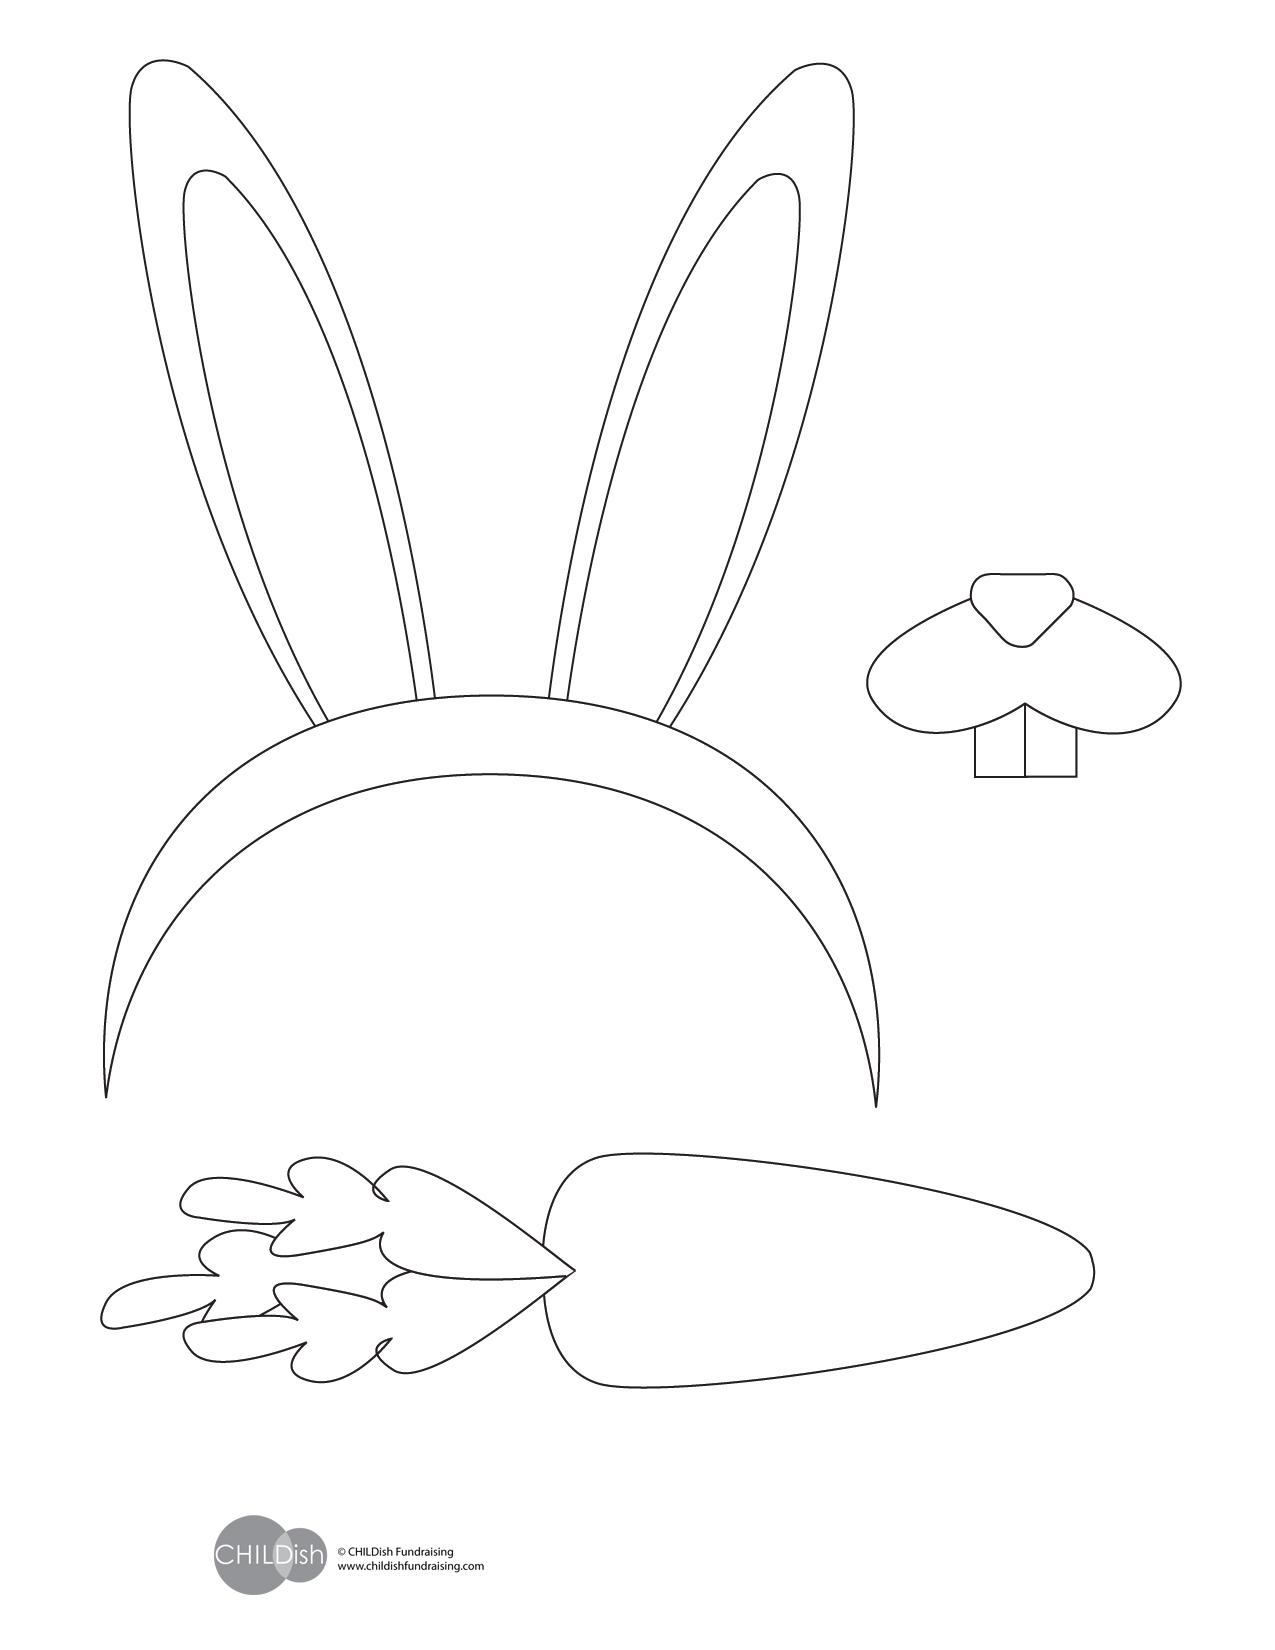 Bunny Ears Childishfundraising